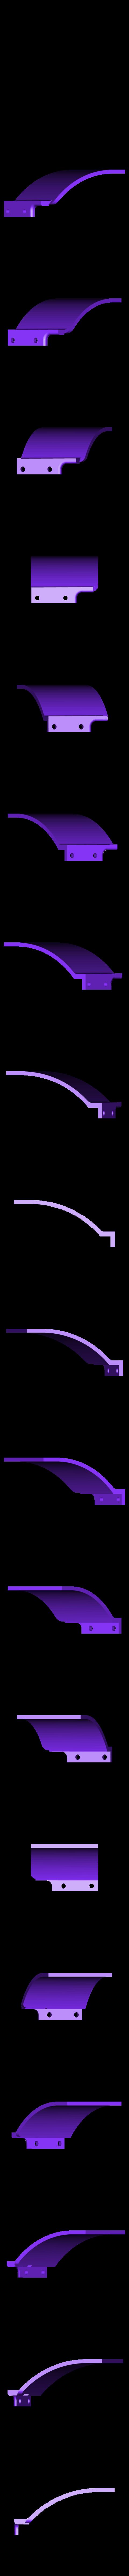 right vent.stl Download free STL file Aryton Senna's Mclaren MP4/6 3d Printed RC F1 Car • 3D printing design, brett